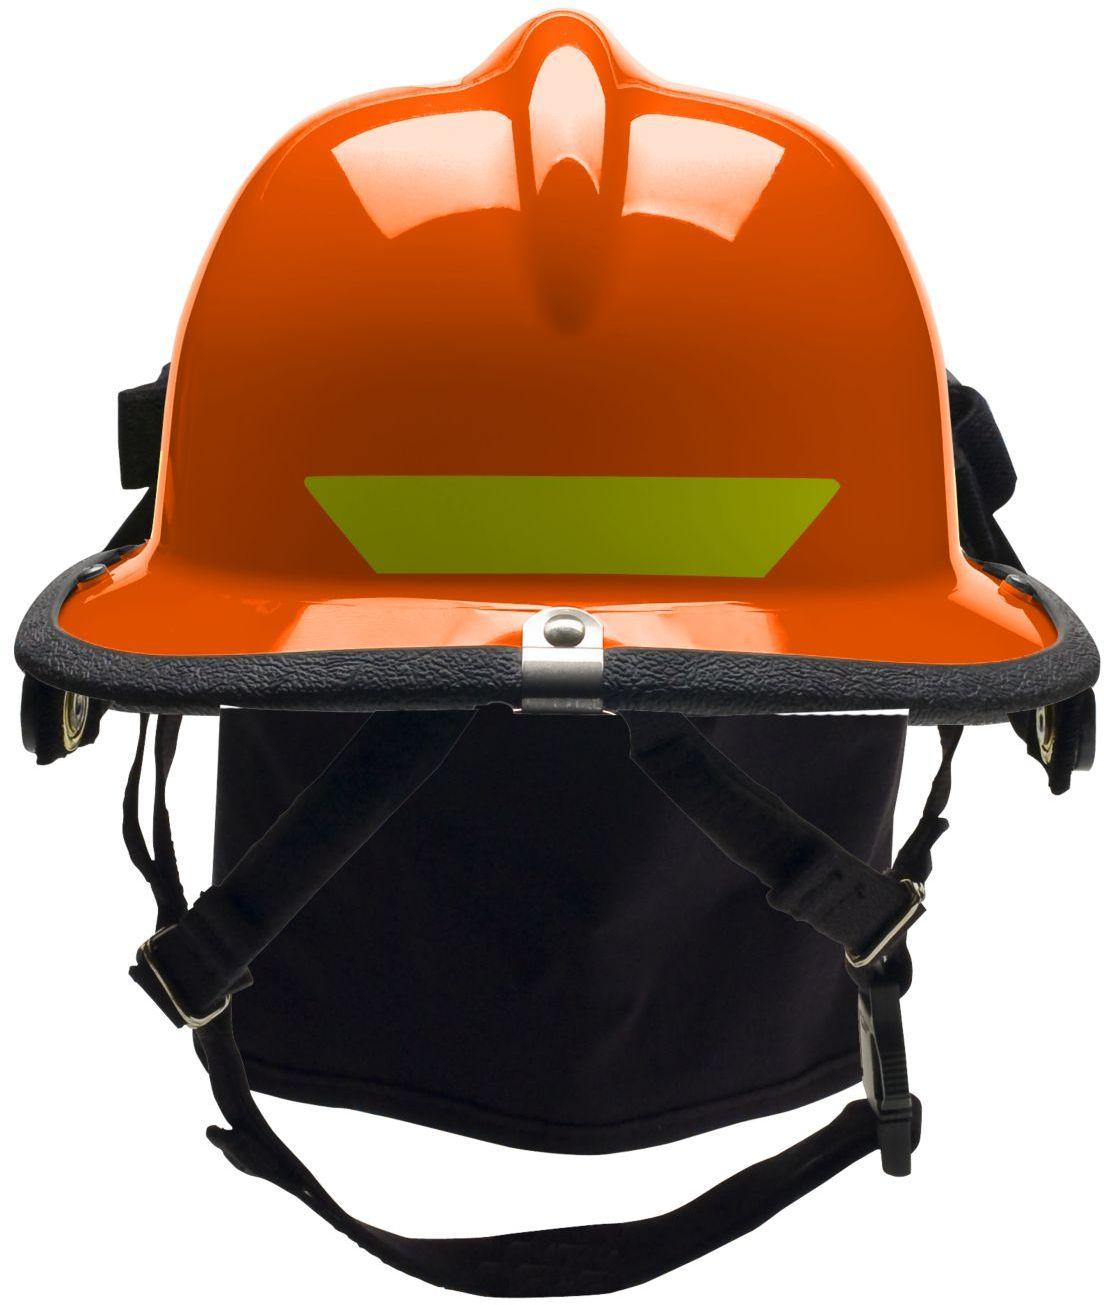 Bullard USRX Rescue Helmet